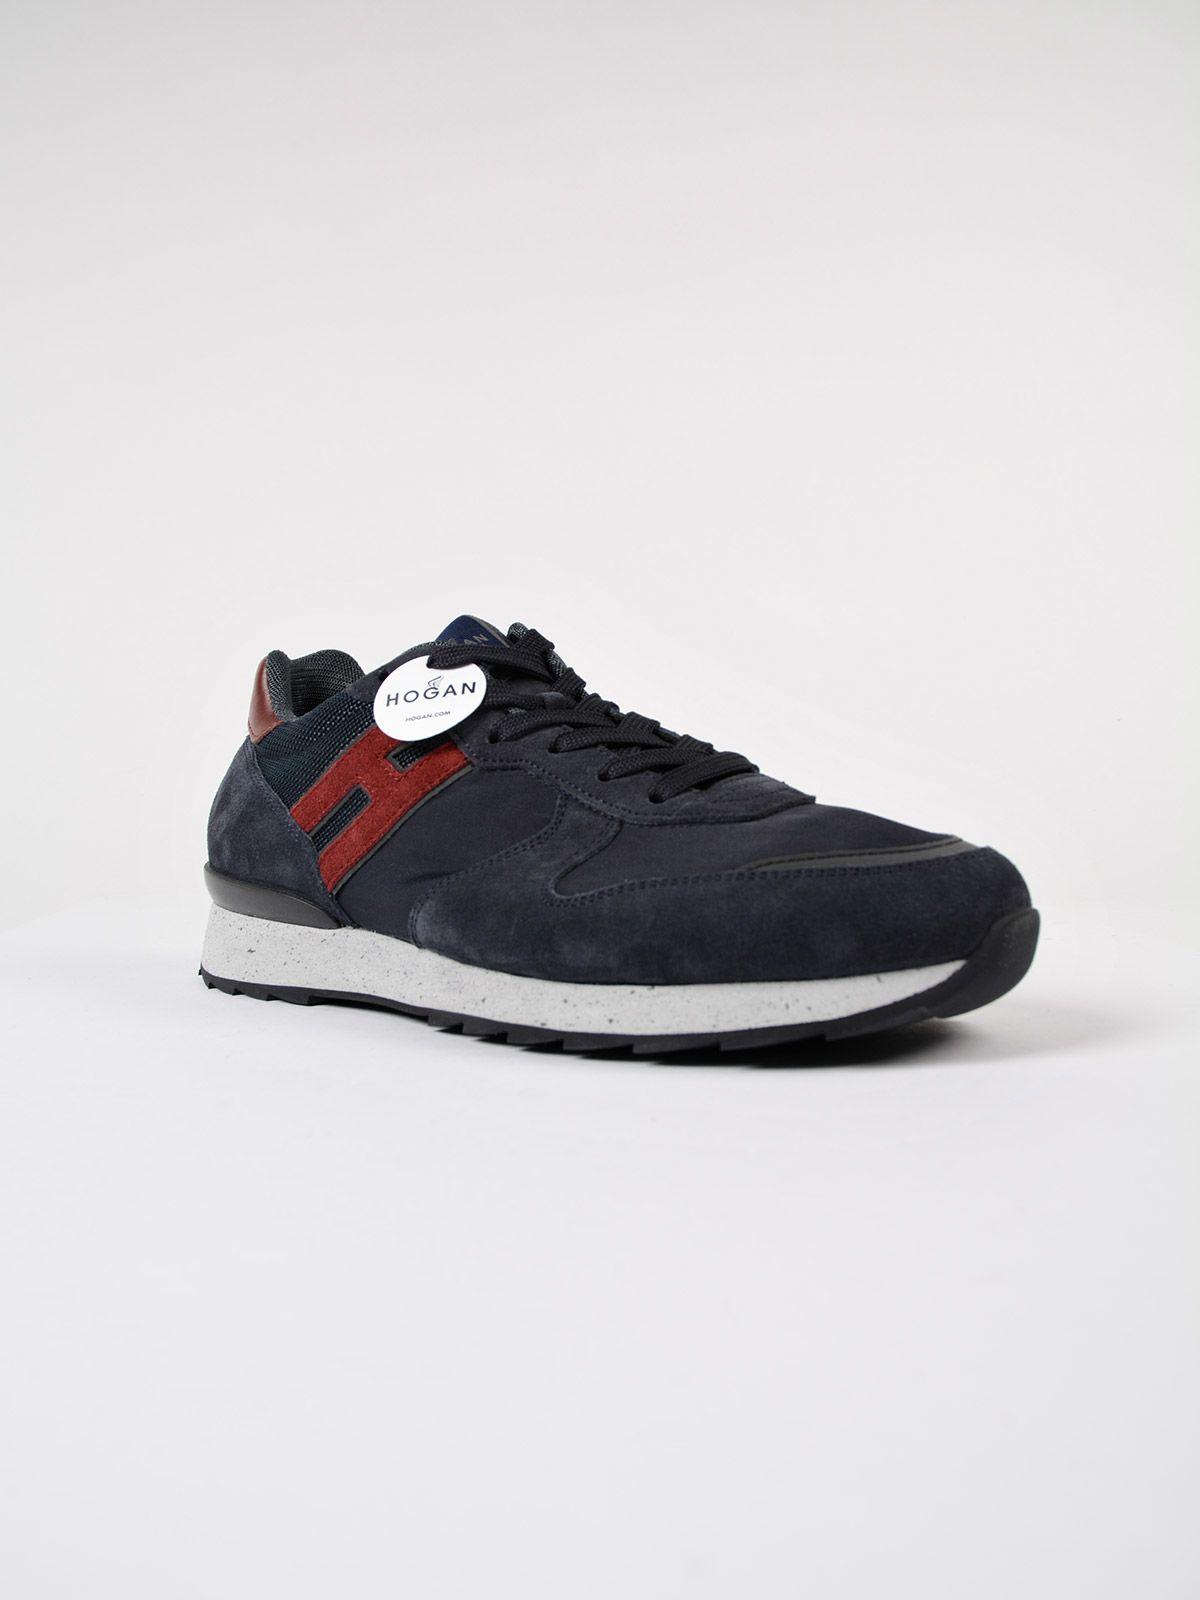 R261 lace-up sneakers - Black Hogan RT5leqz